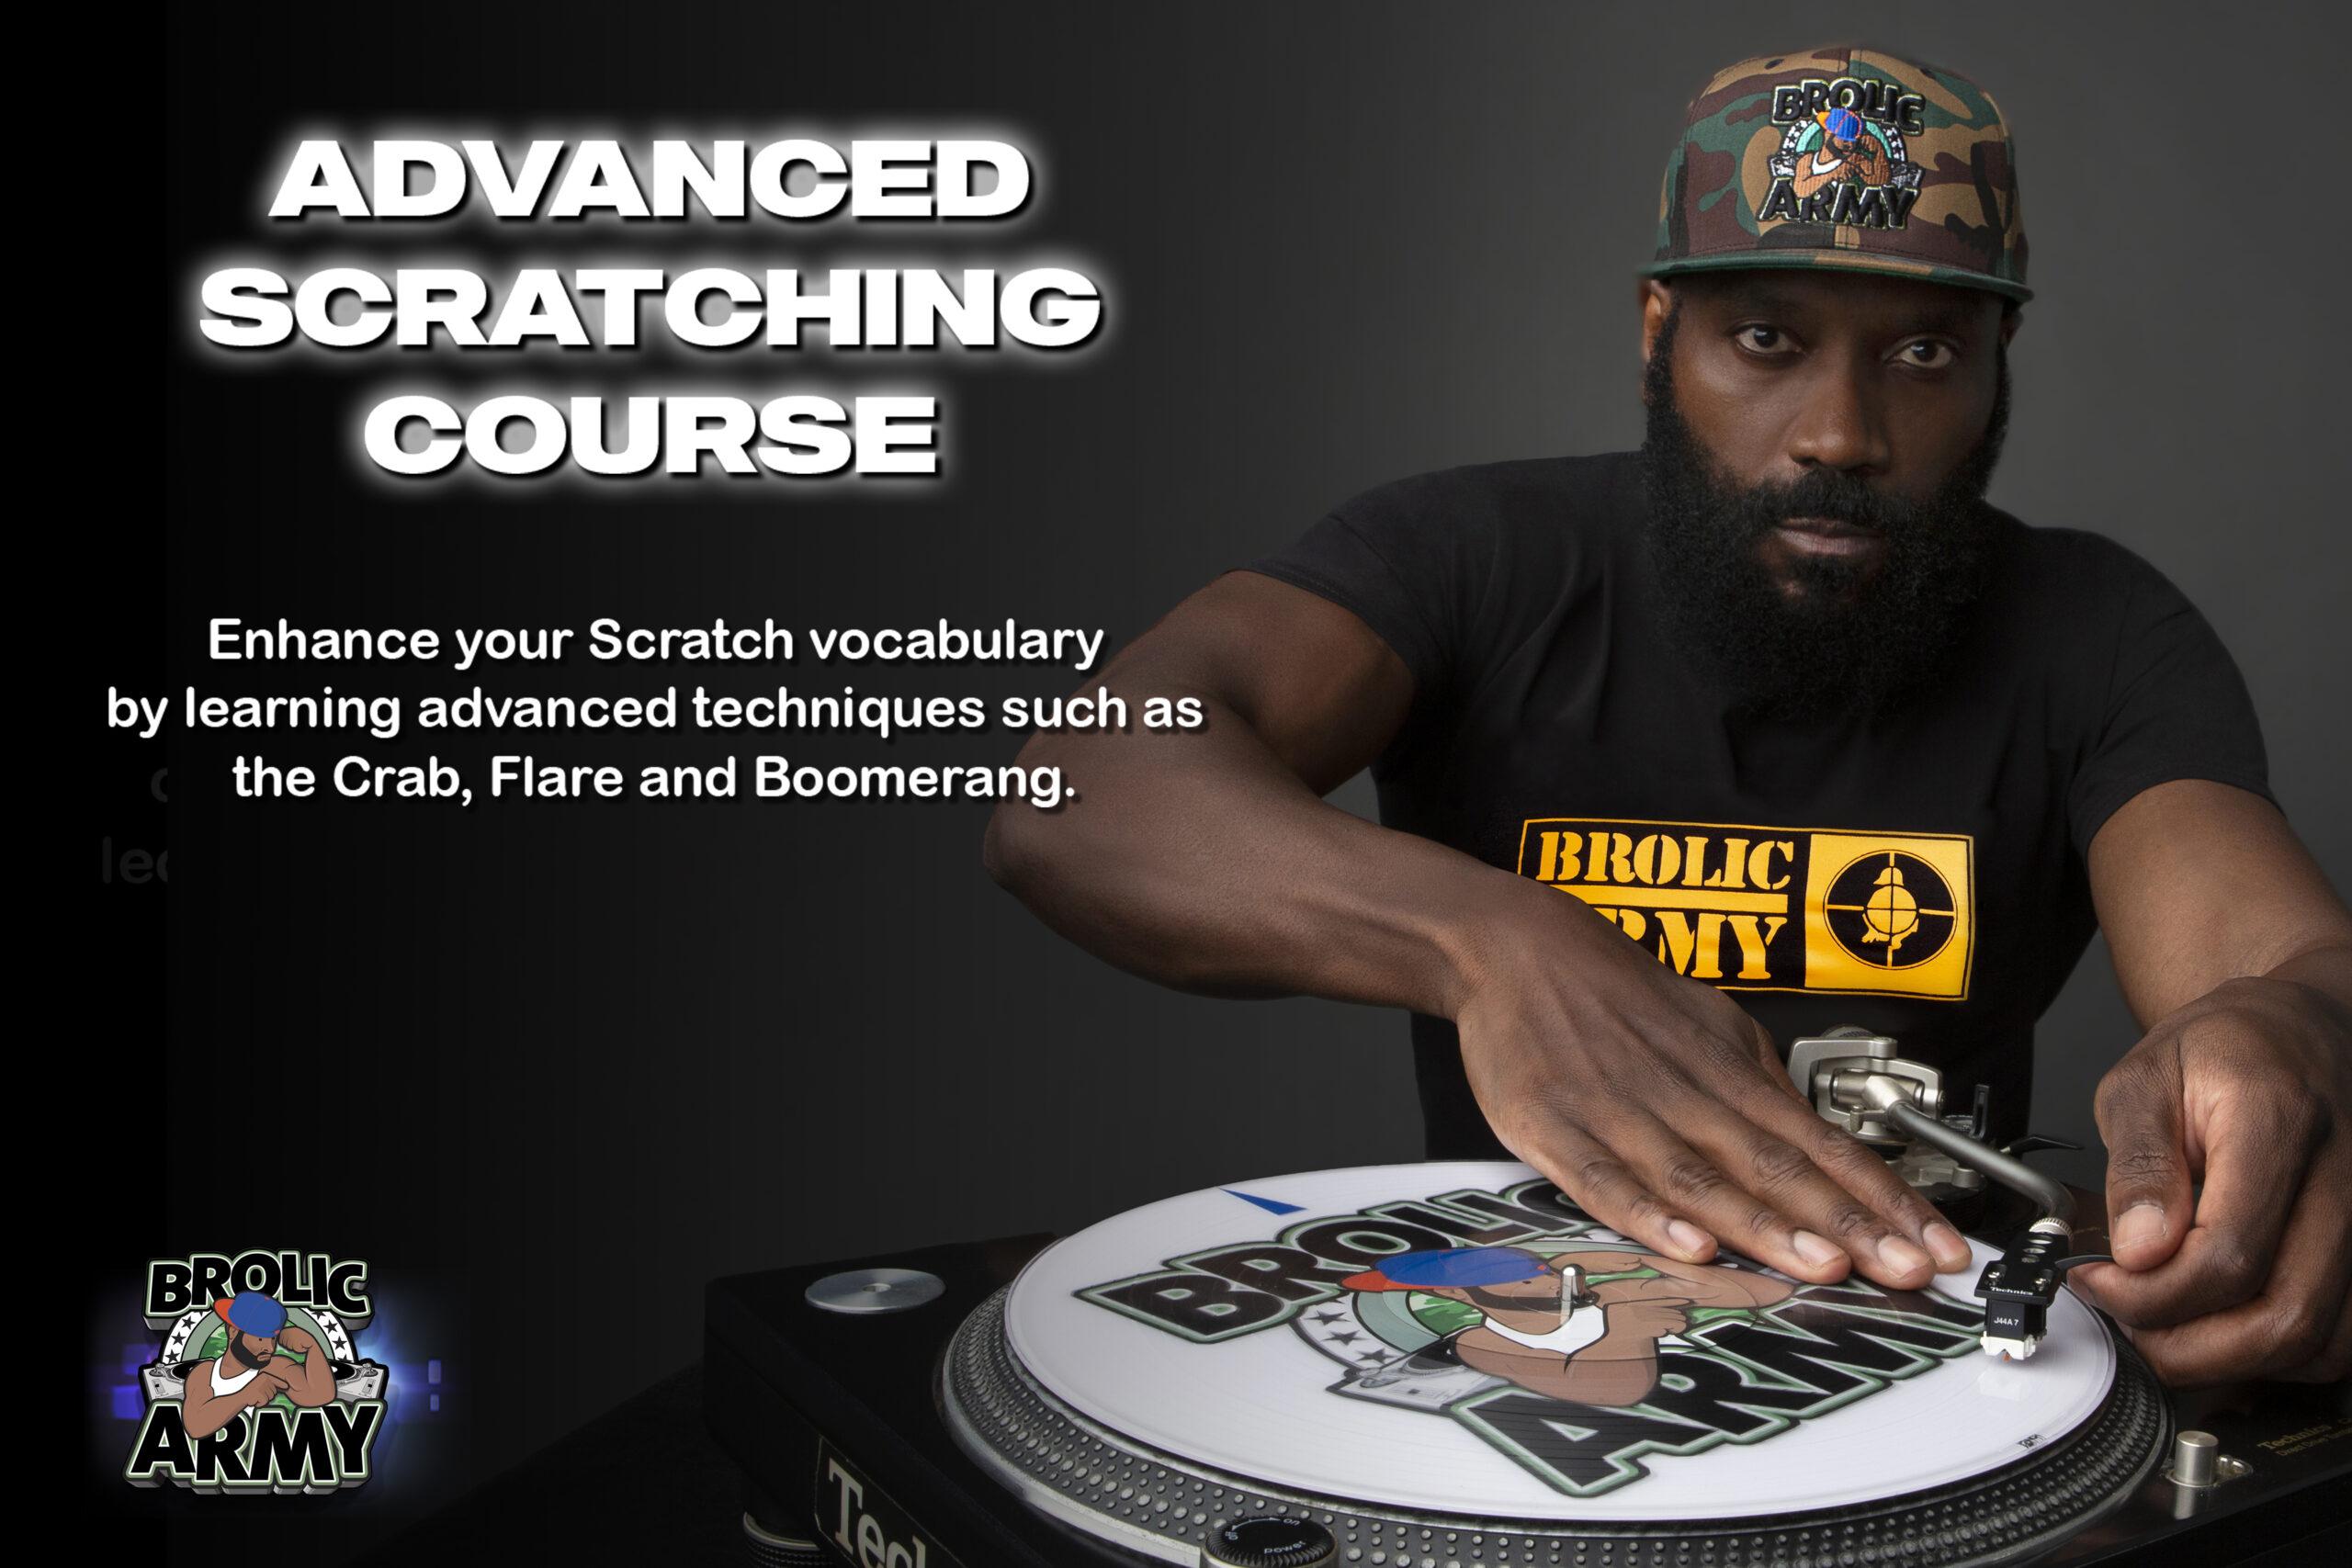 Advanced Scratching